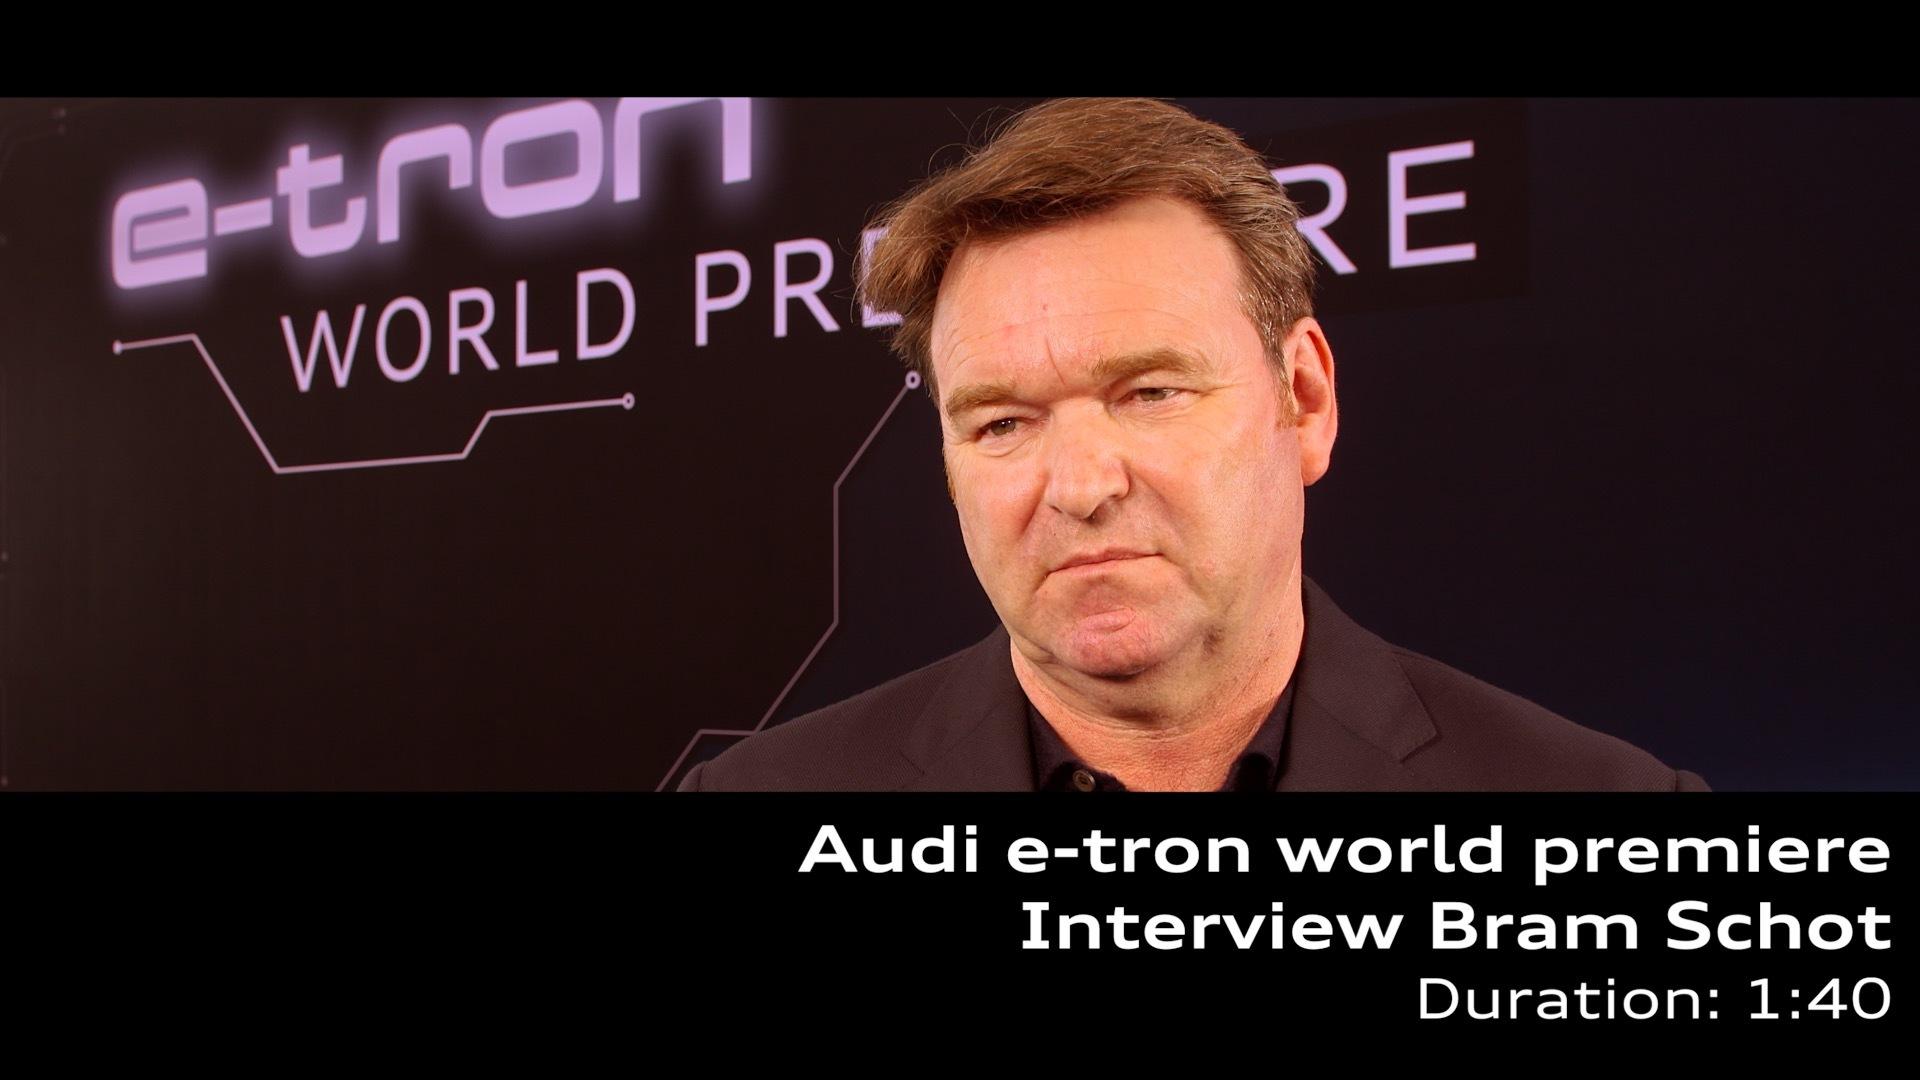 Audi e-tron Weltpremiere Interview Bram Schot